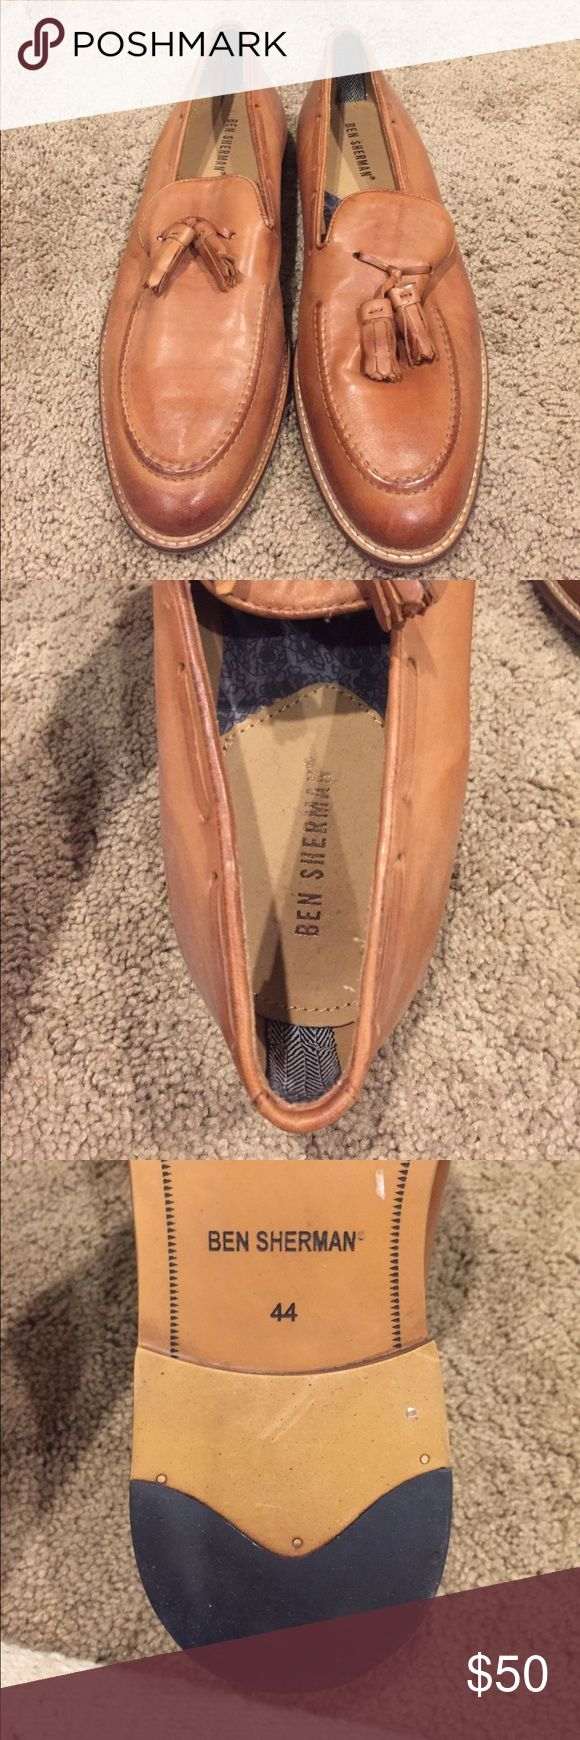 Ben Sherman Brown leather loafers Ben Sherman leather loafers worn once! Size 44 Ben Sherman Shoes Loafers & Slip-Ons